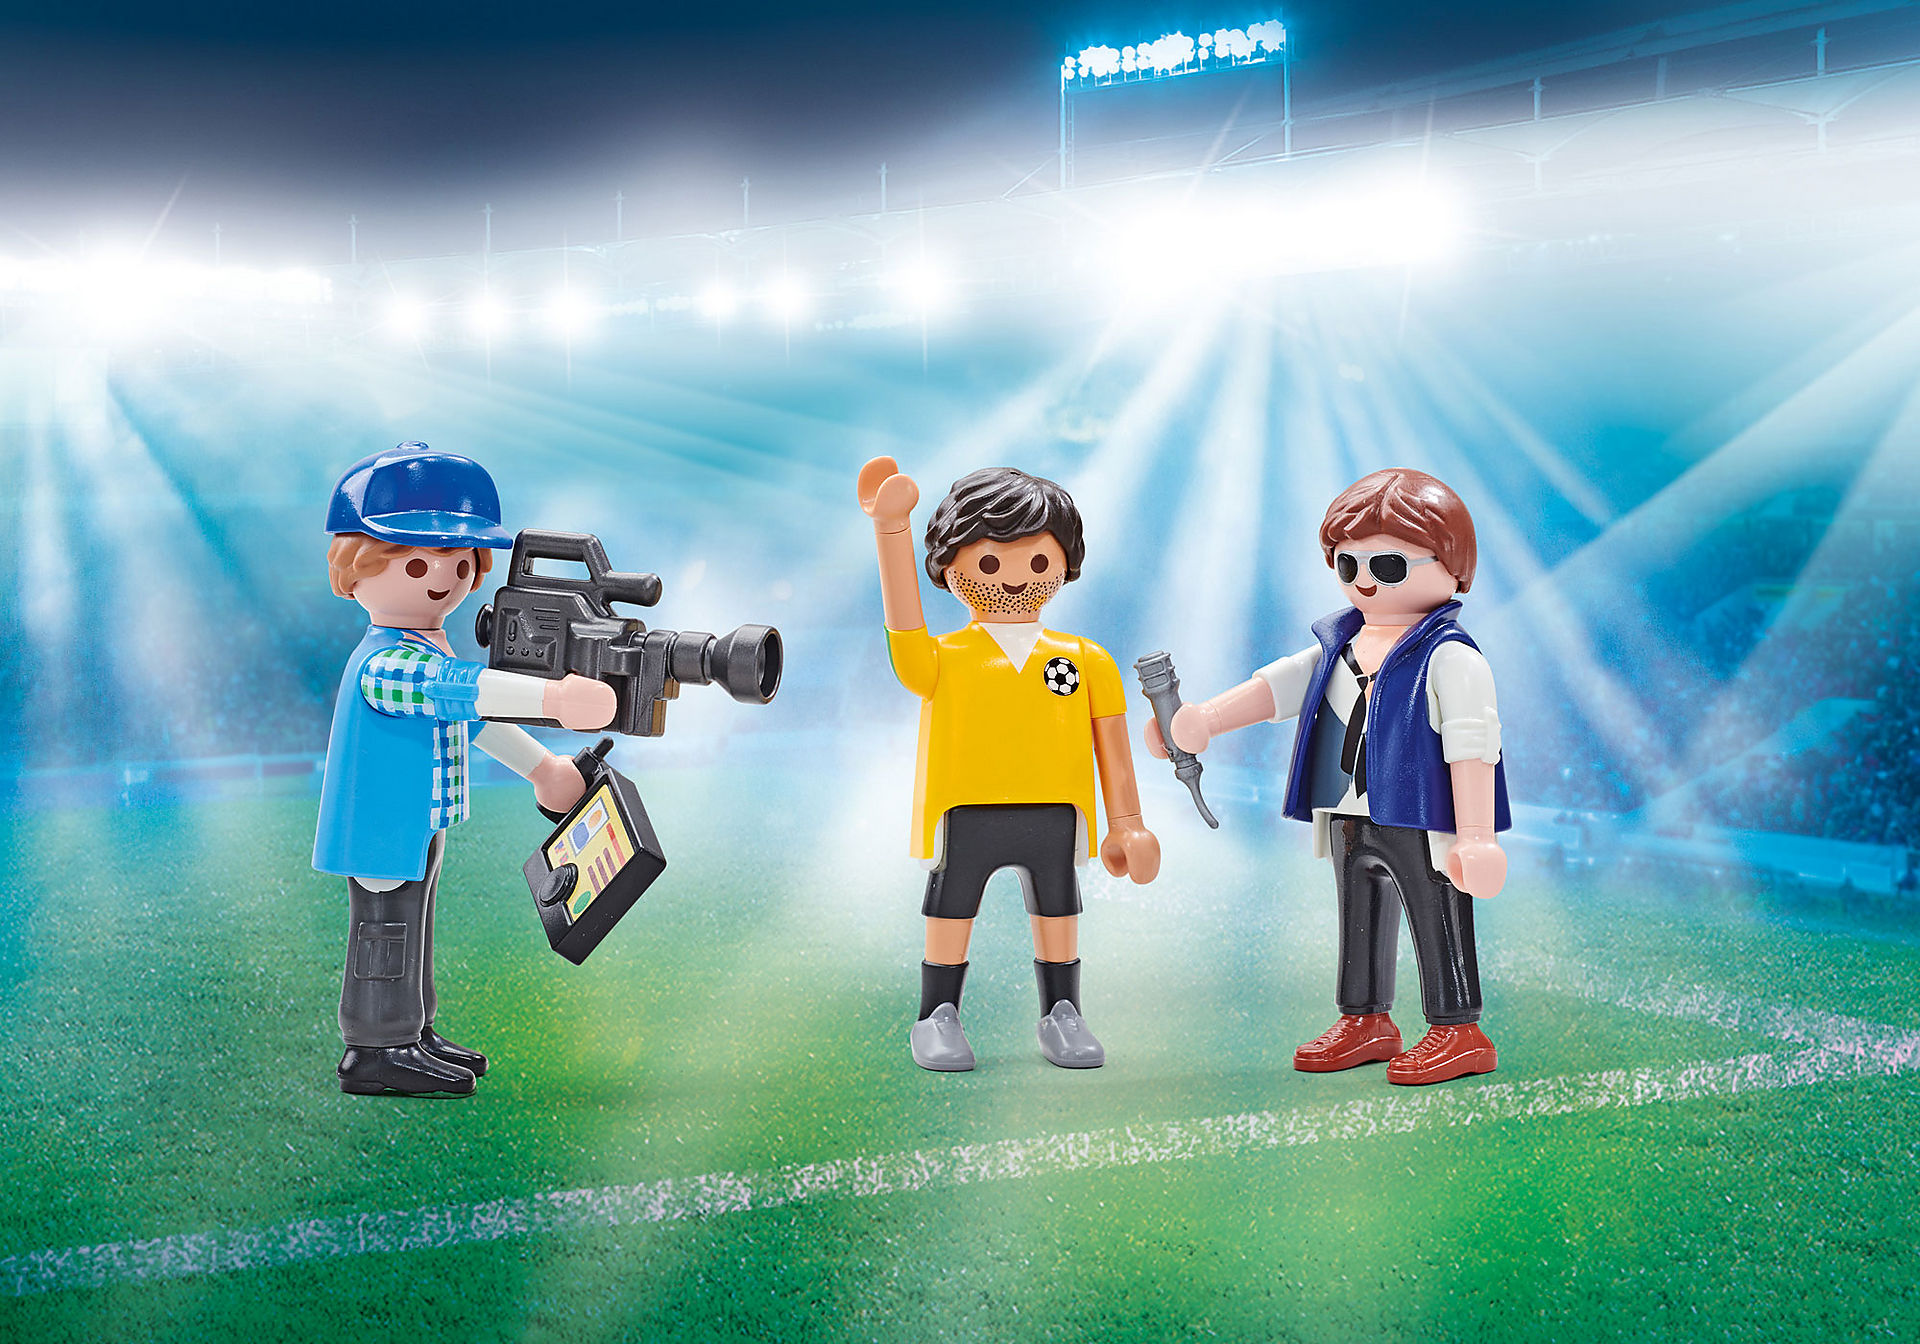 9825 Televisieploeg met voetbalspeler zoom image1